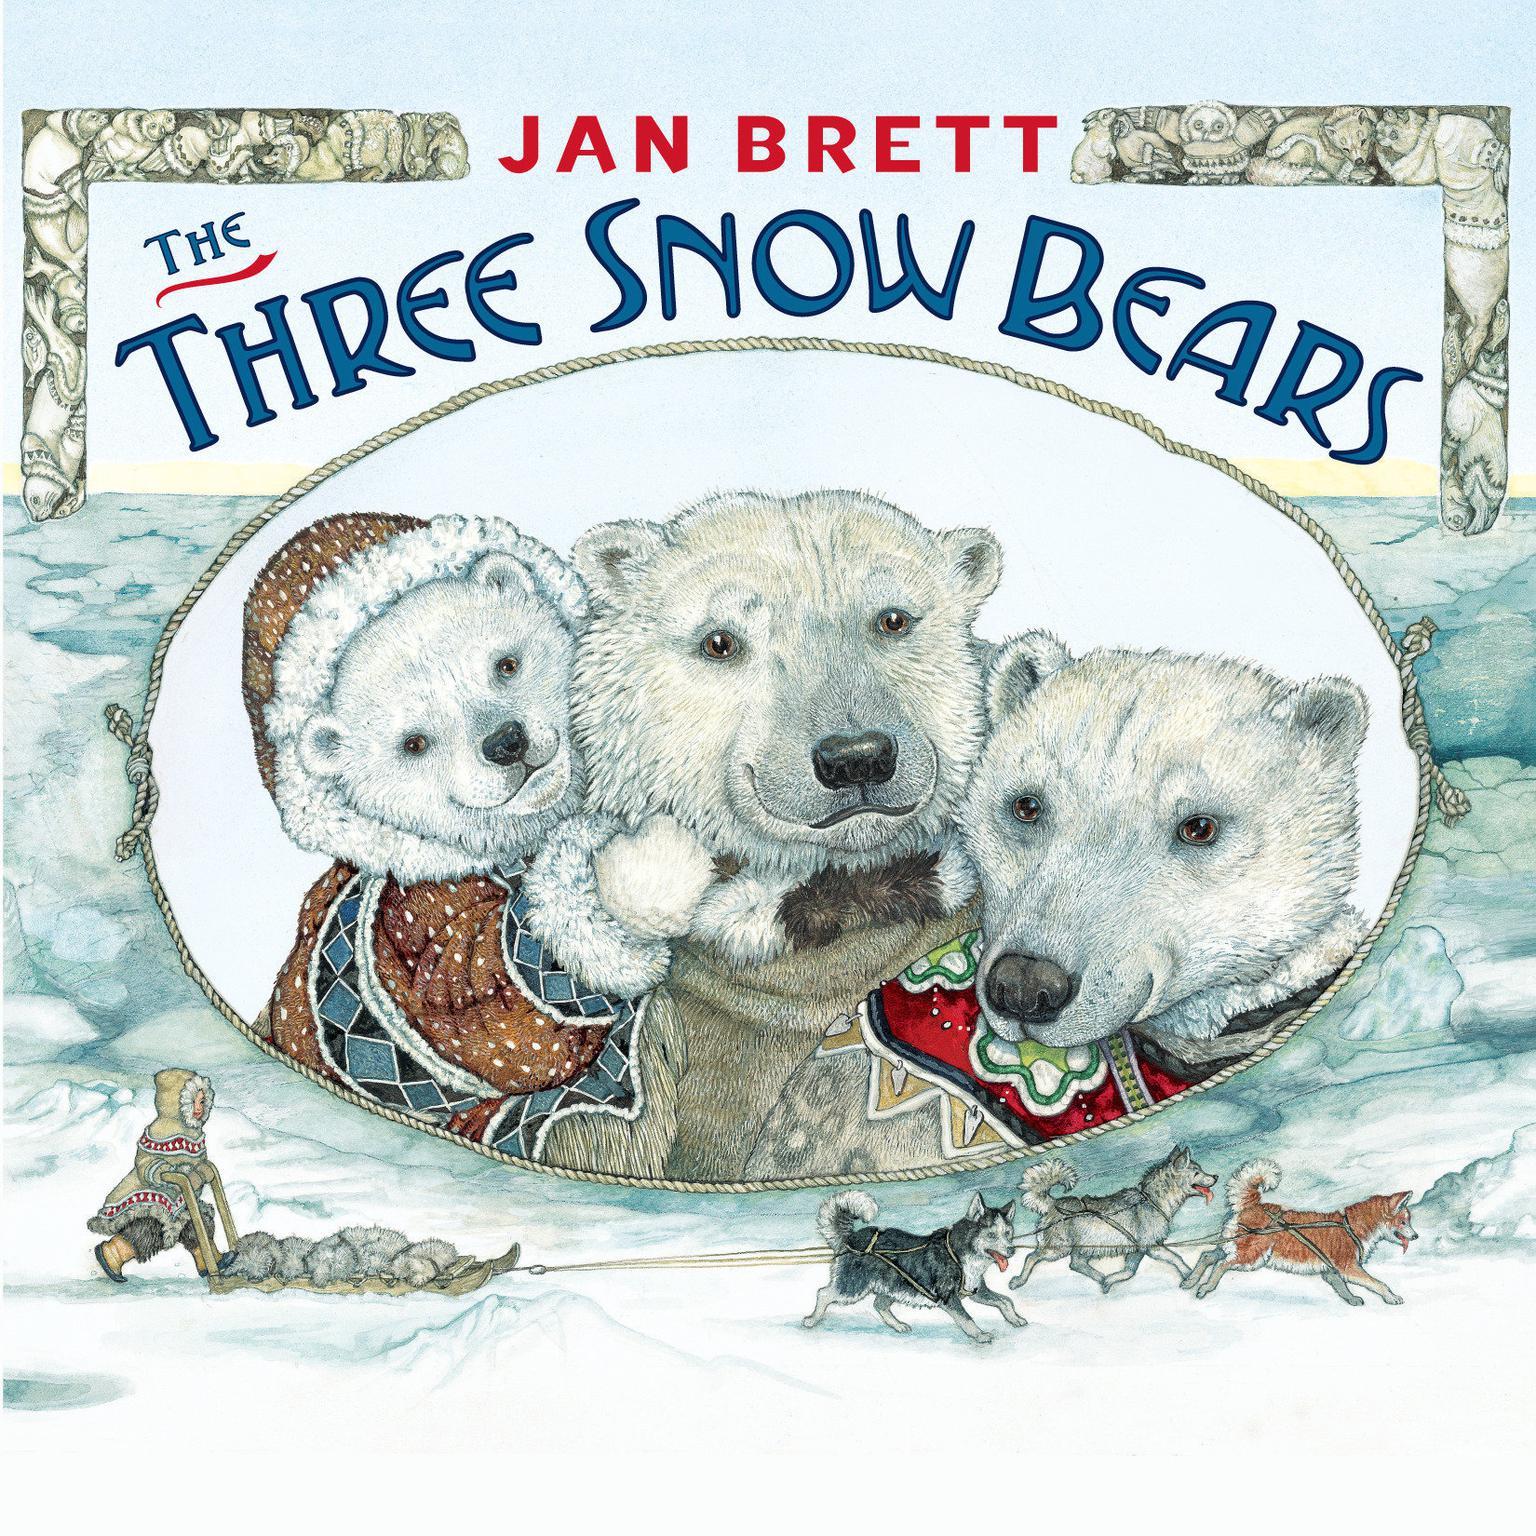 The Three Snow Bears Audiobook, by Jan Brett